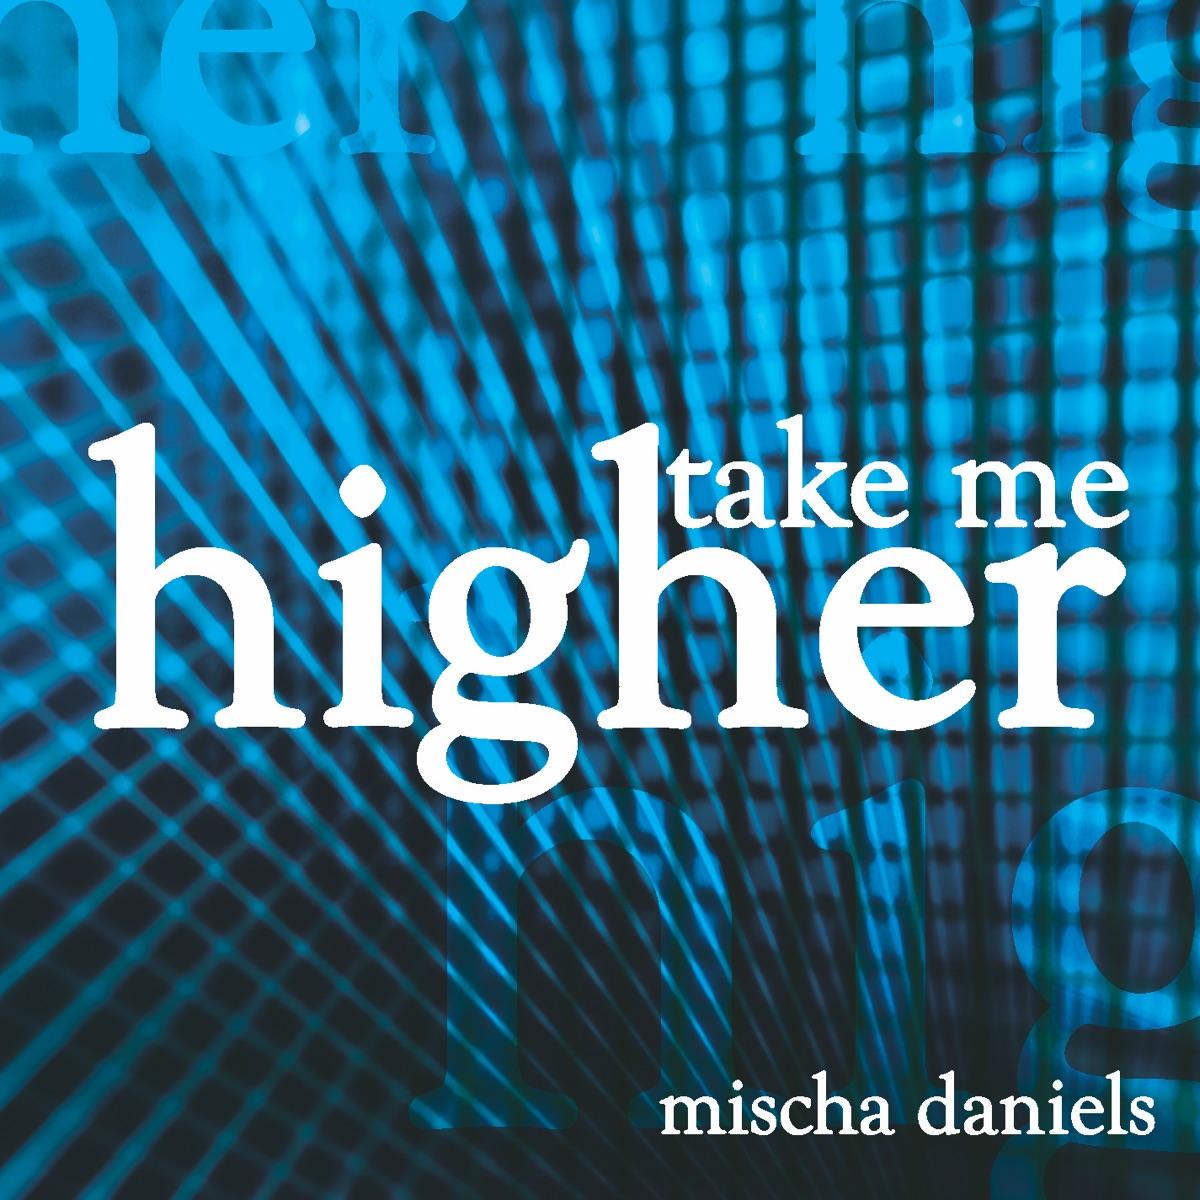 Take Me Higher - EP Mischa Daniels CD cover